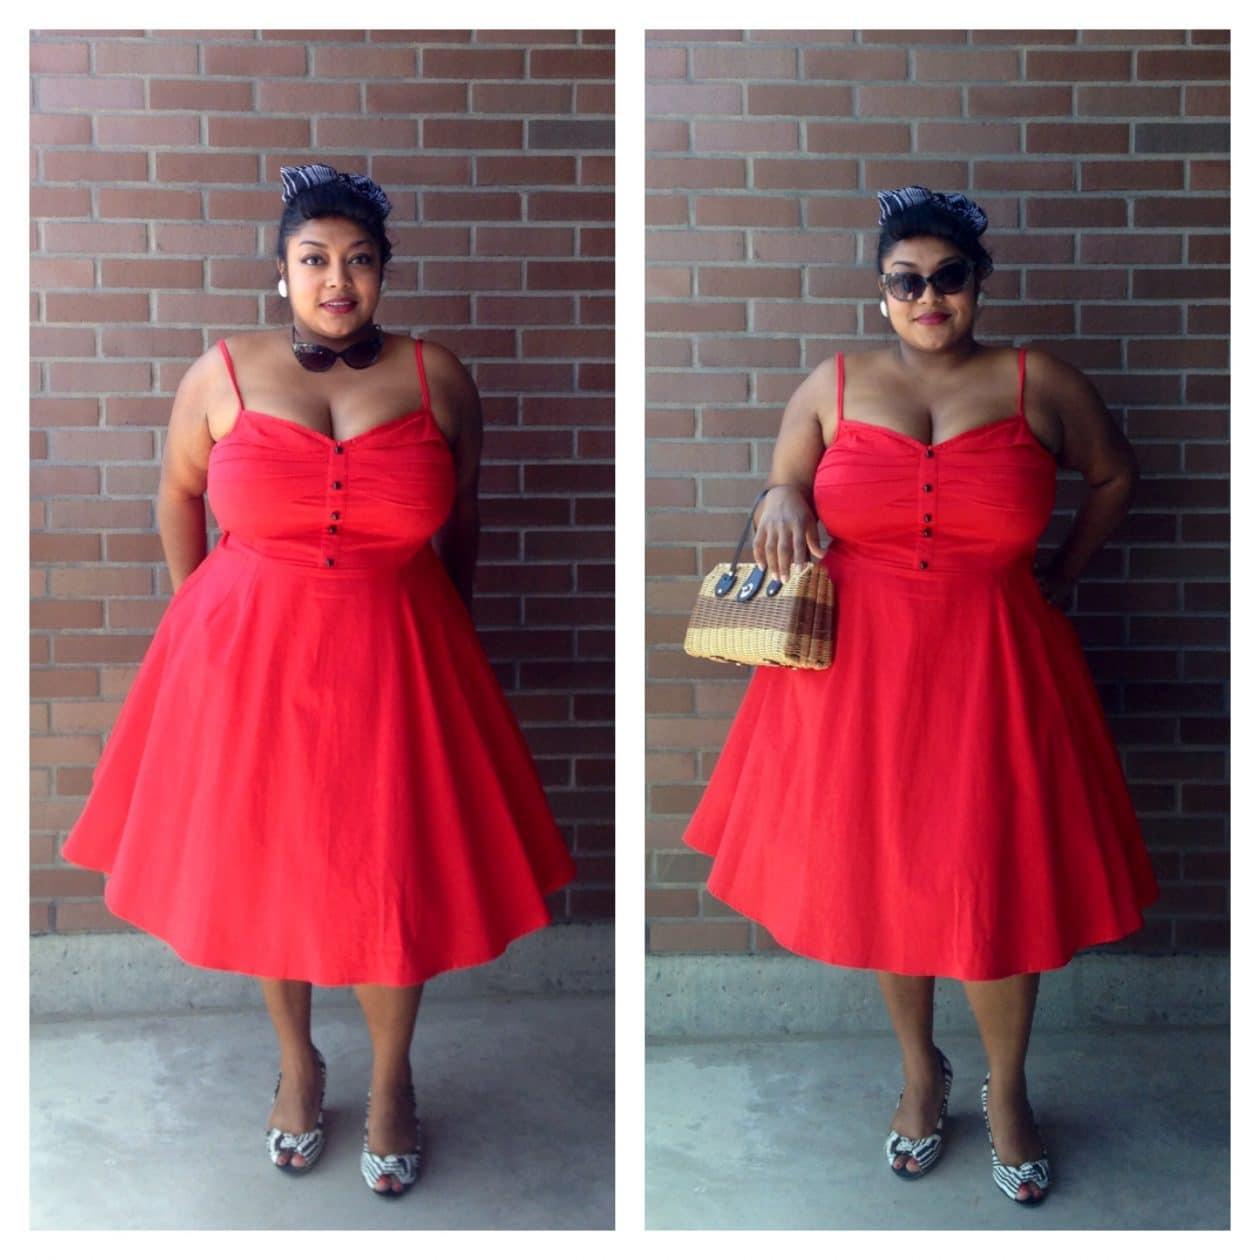 Plus Size Fashion Blogger: Irene Kavita